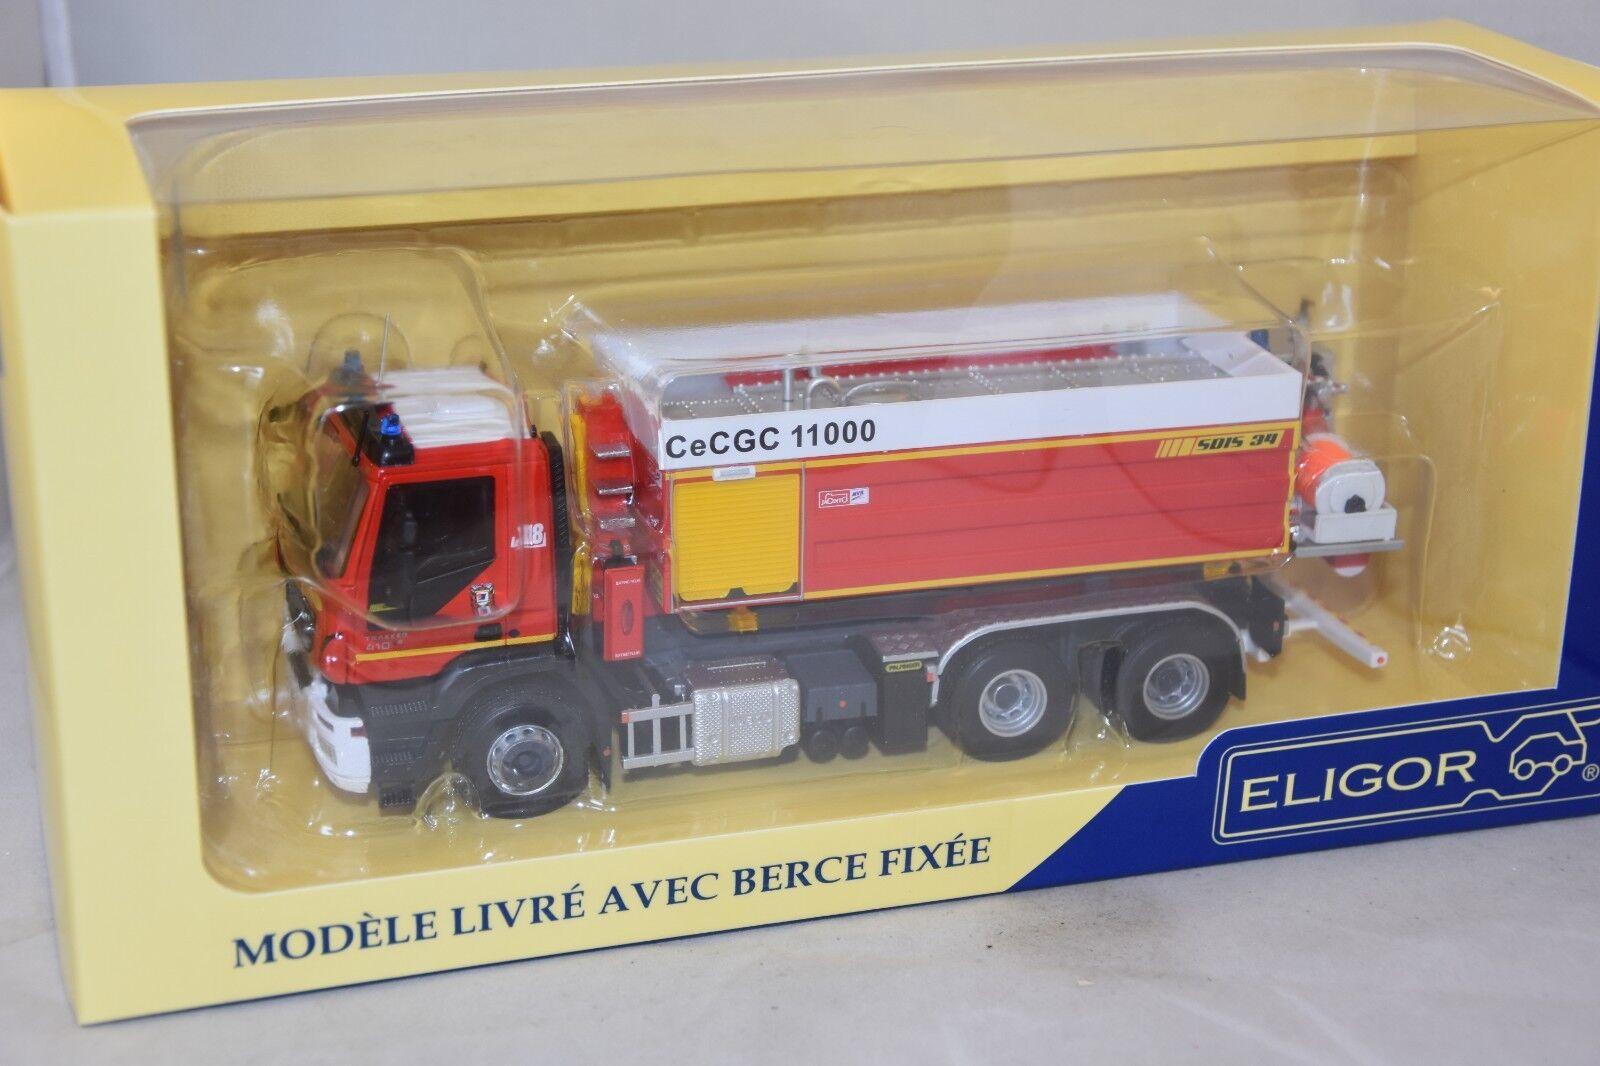 Eligor 115940 - IVECO Trakker 410 VPCE PALFINGER cellule  Jacinto pompiers 1 43  magasin d'offre